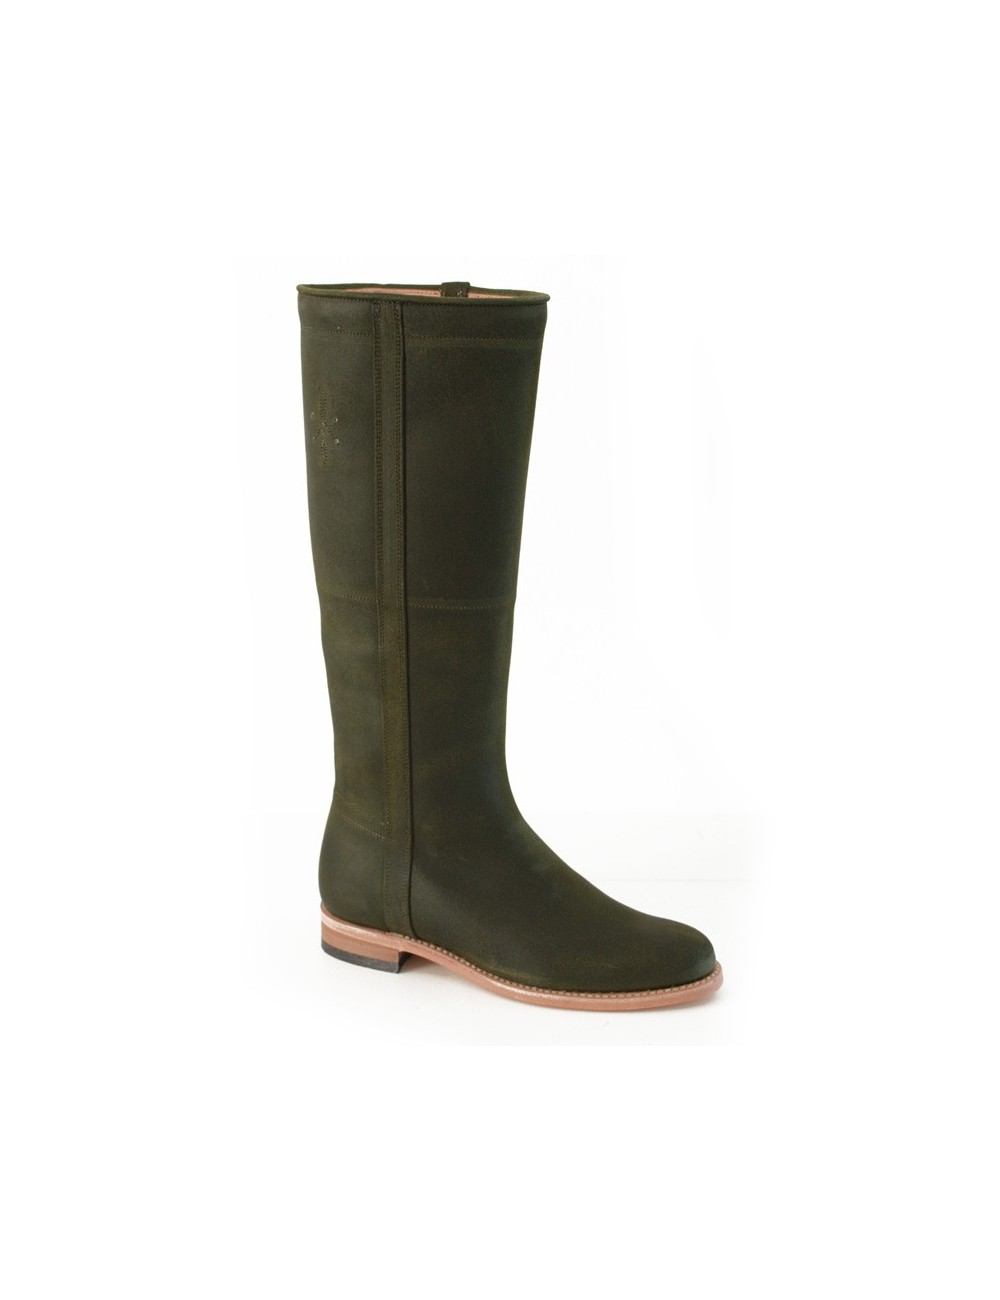 Bottes cavalières - Bottes camarguaises cuir vert kaki